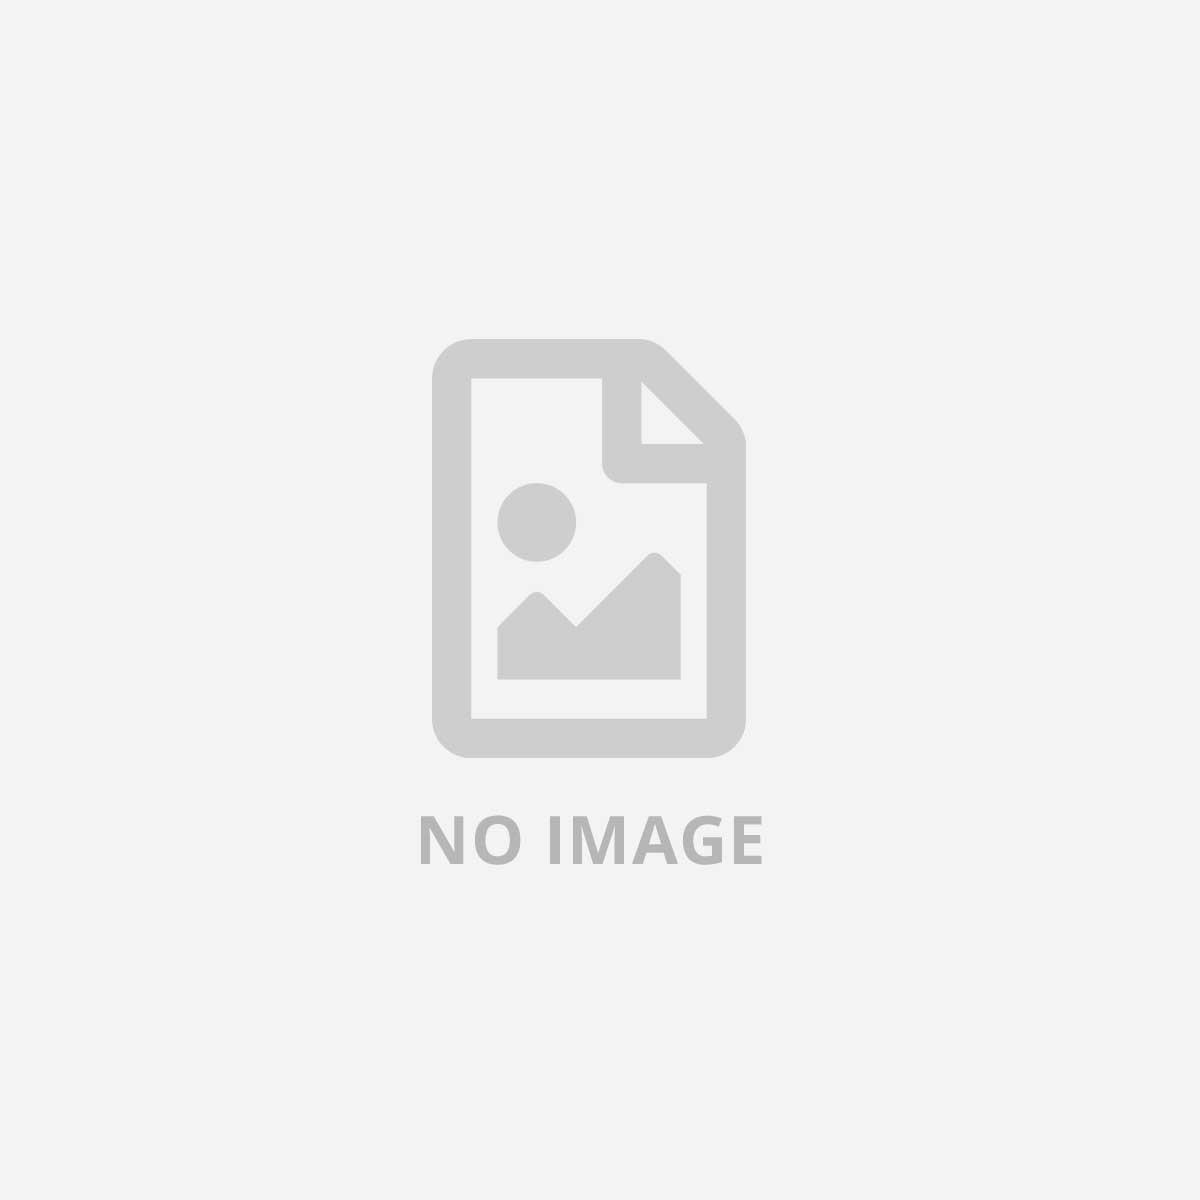 KYOCERA IB-33